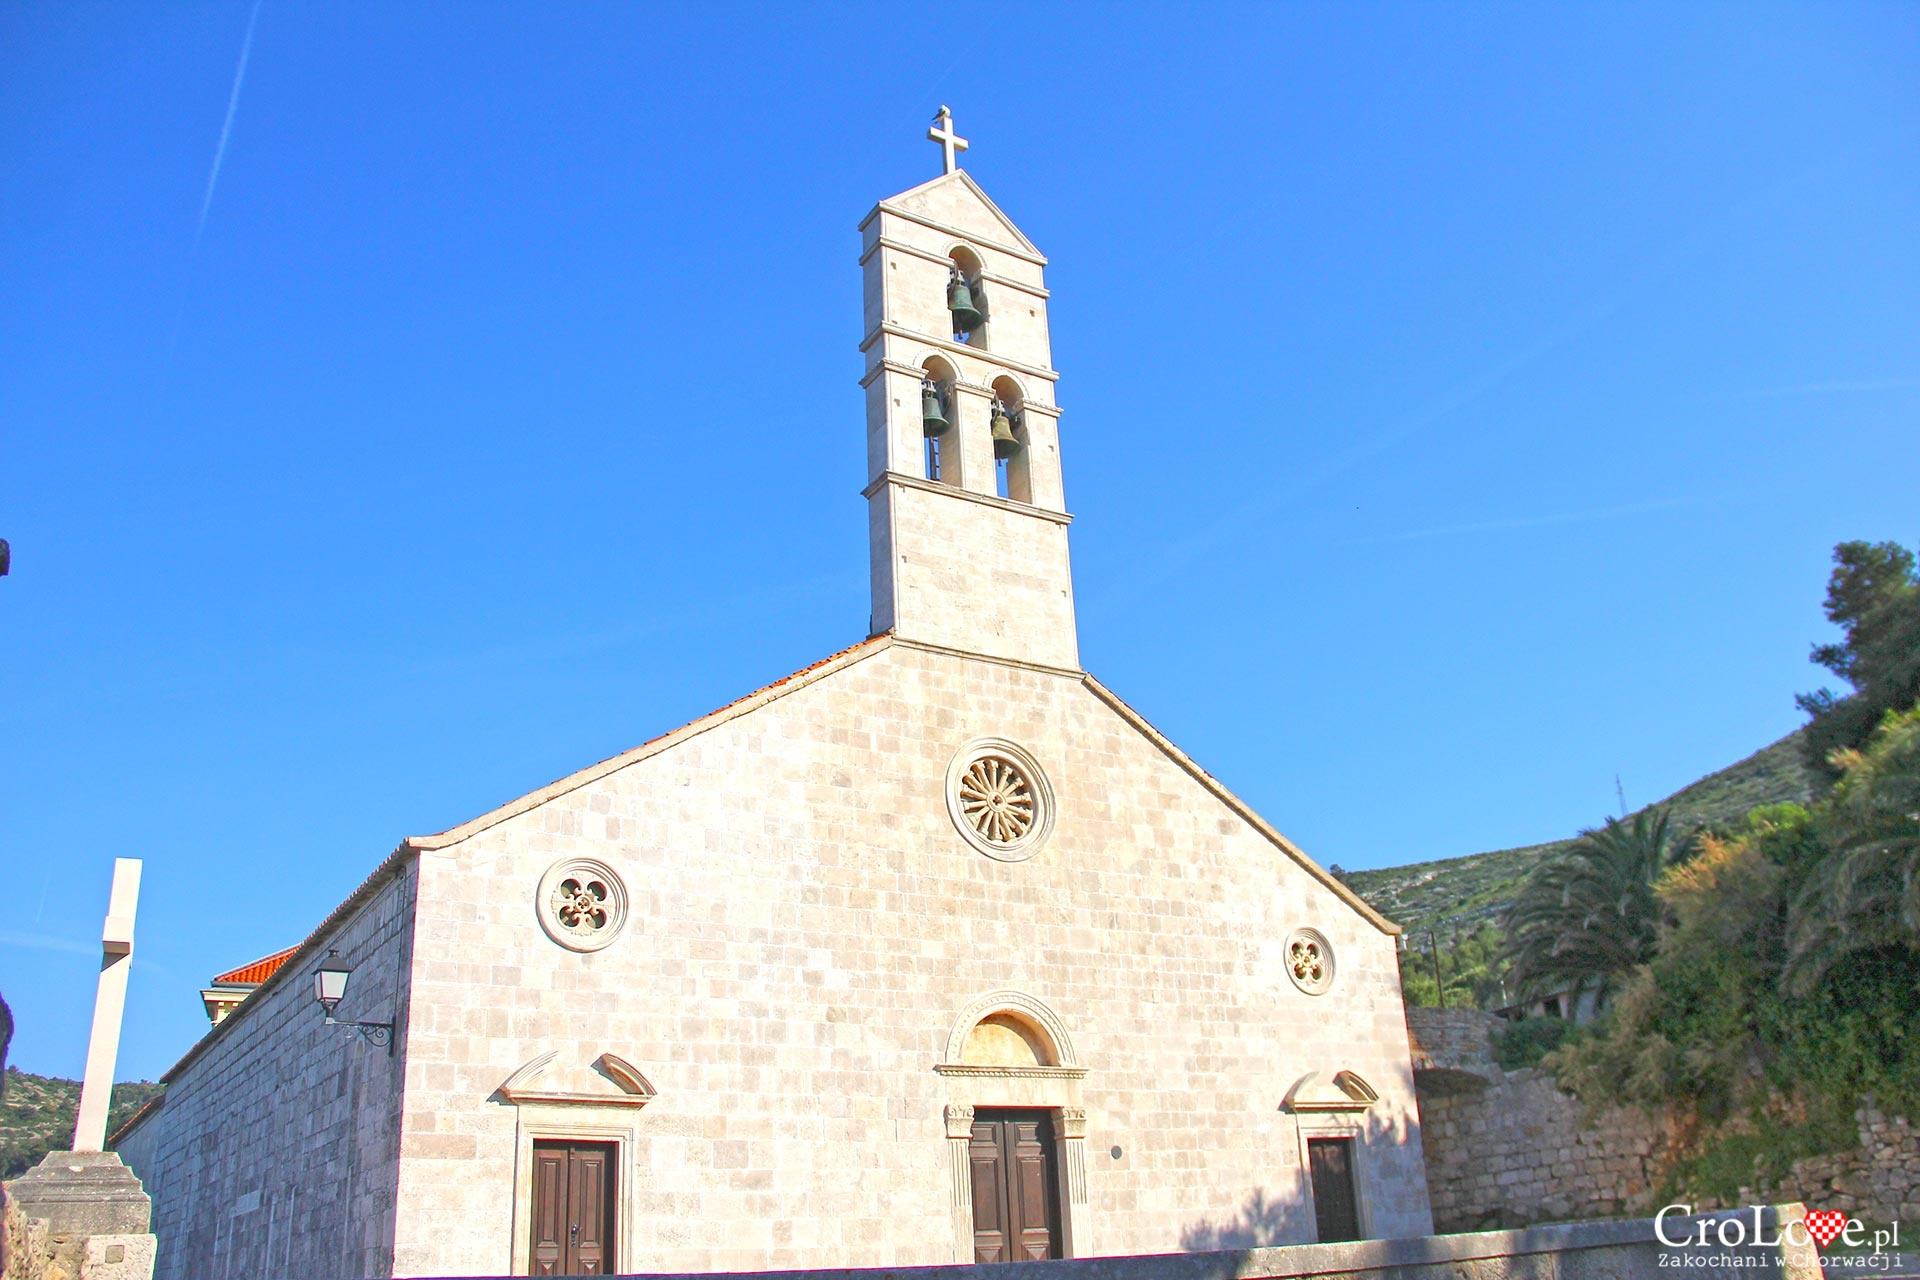 Kościół Matki Bożej z groty w Vis